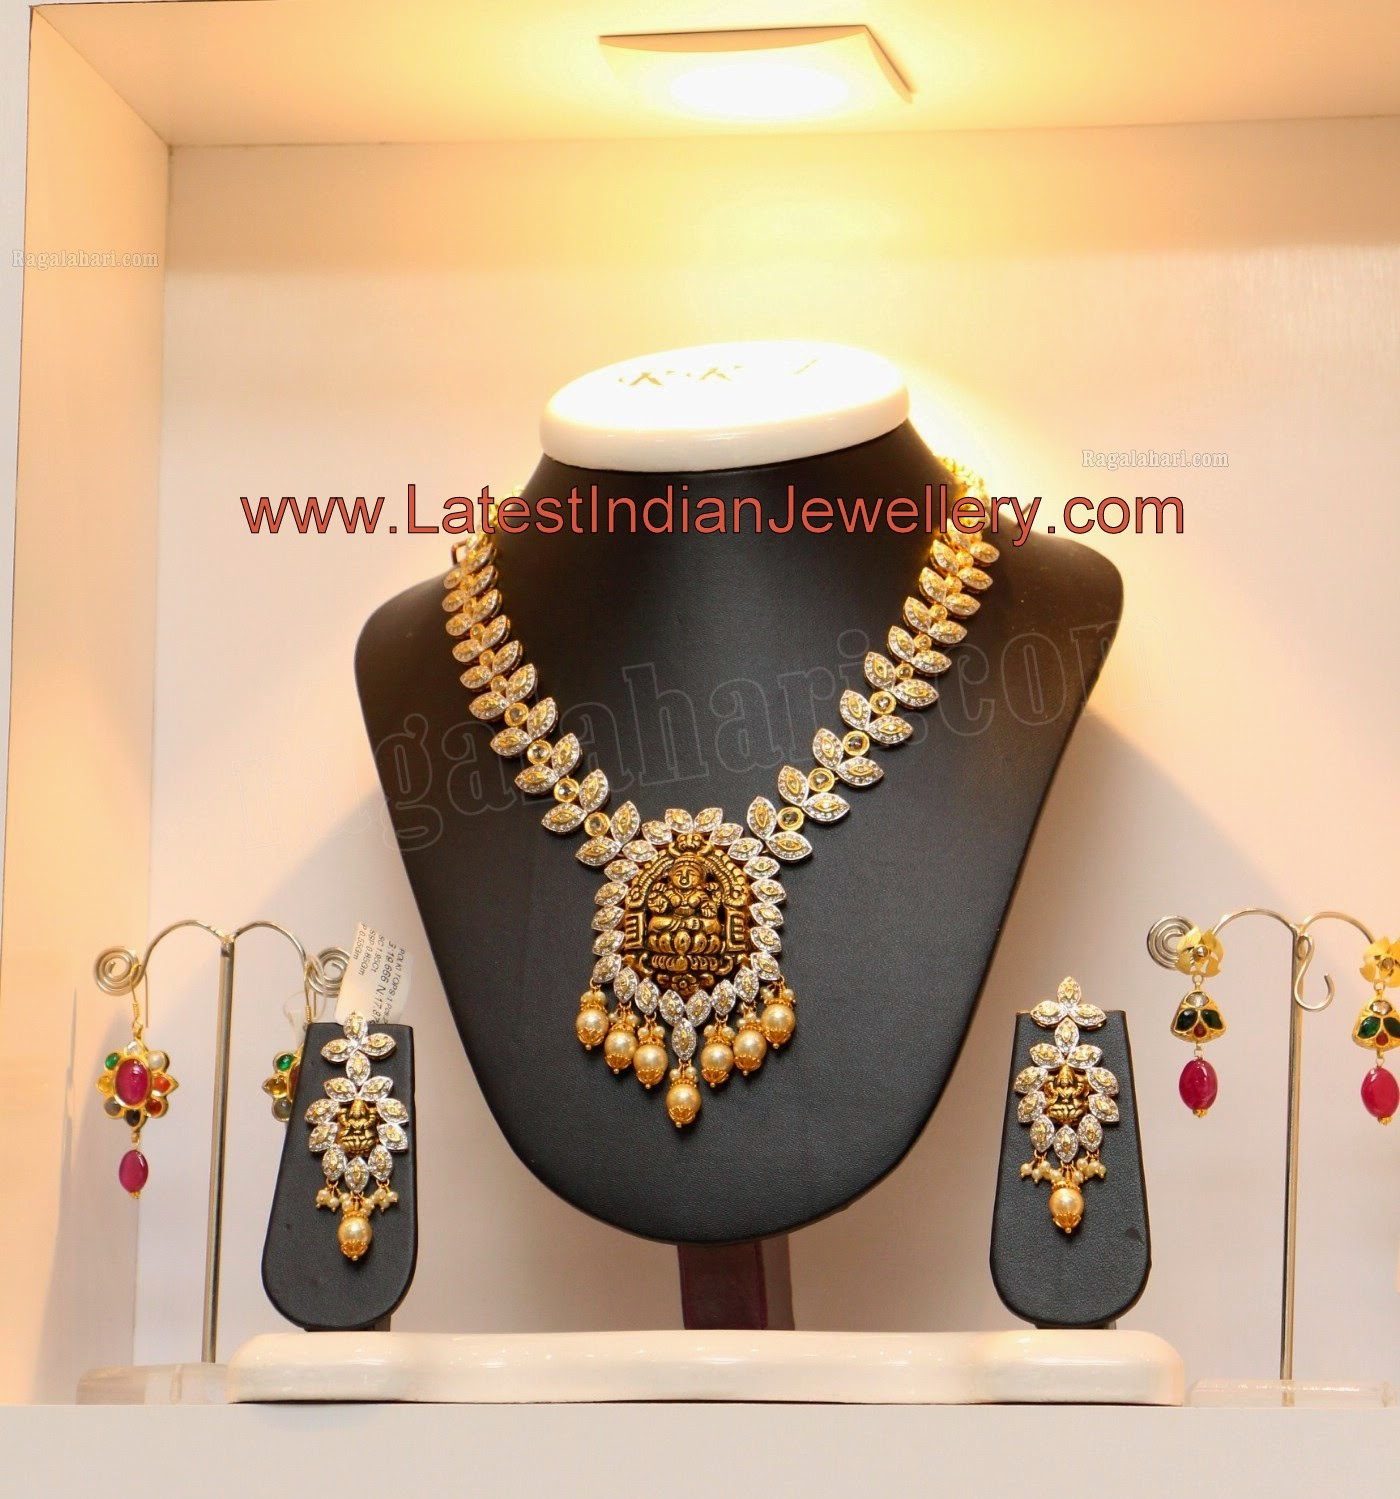 Temple Jewellery in Diamonds